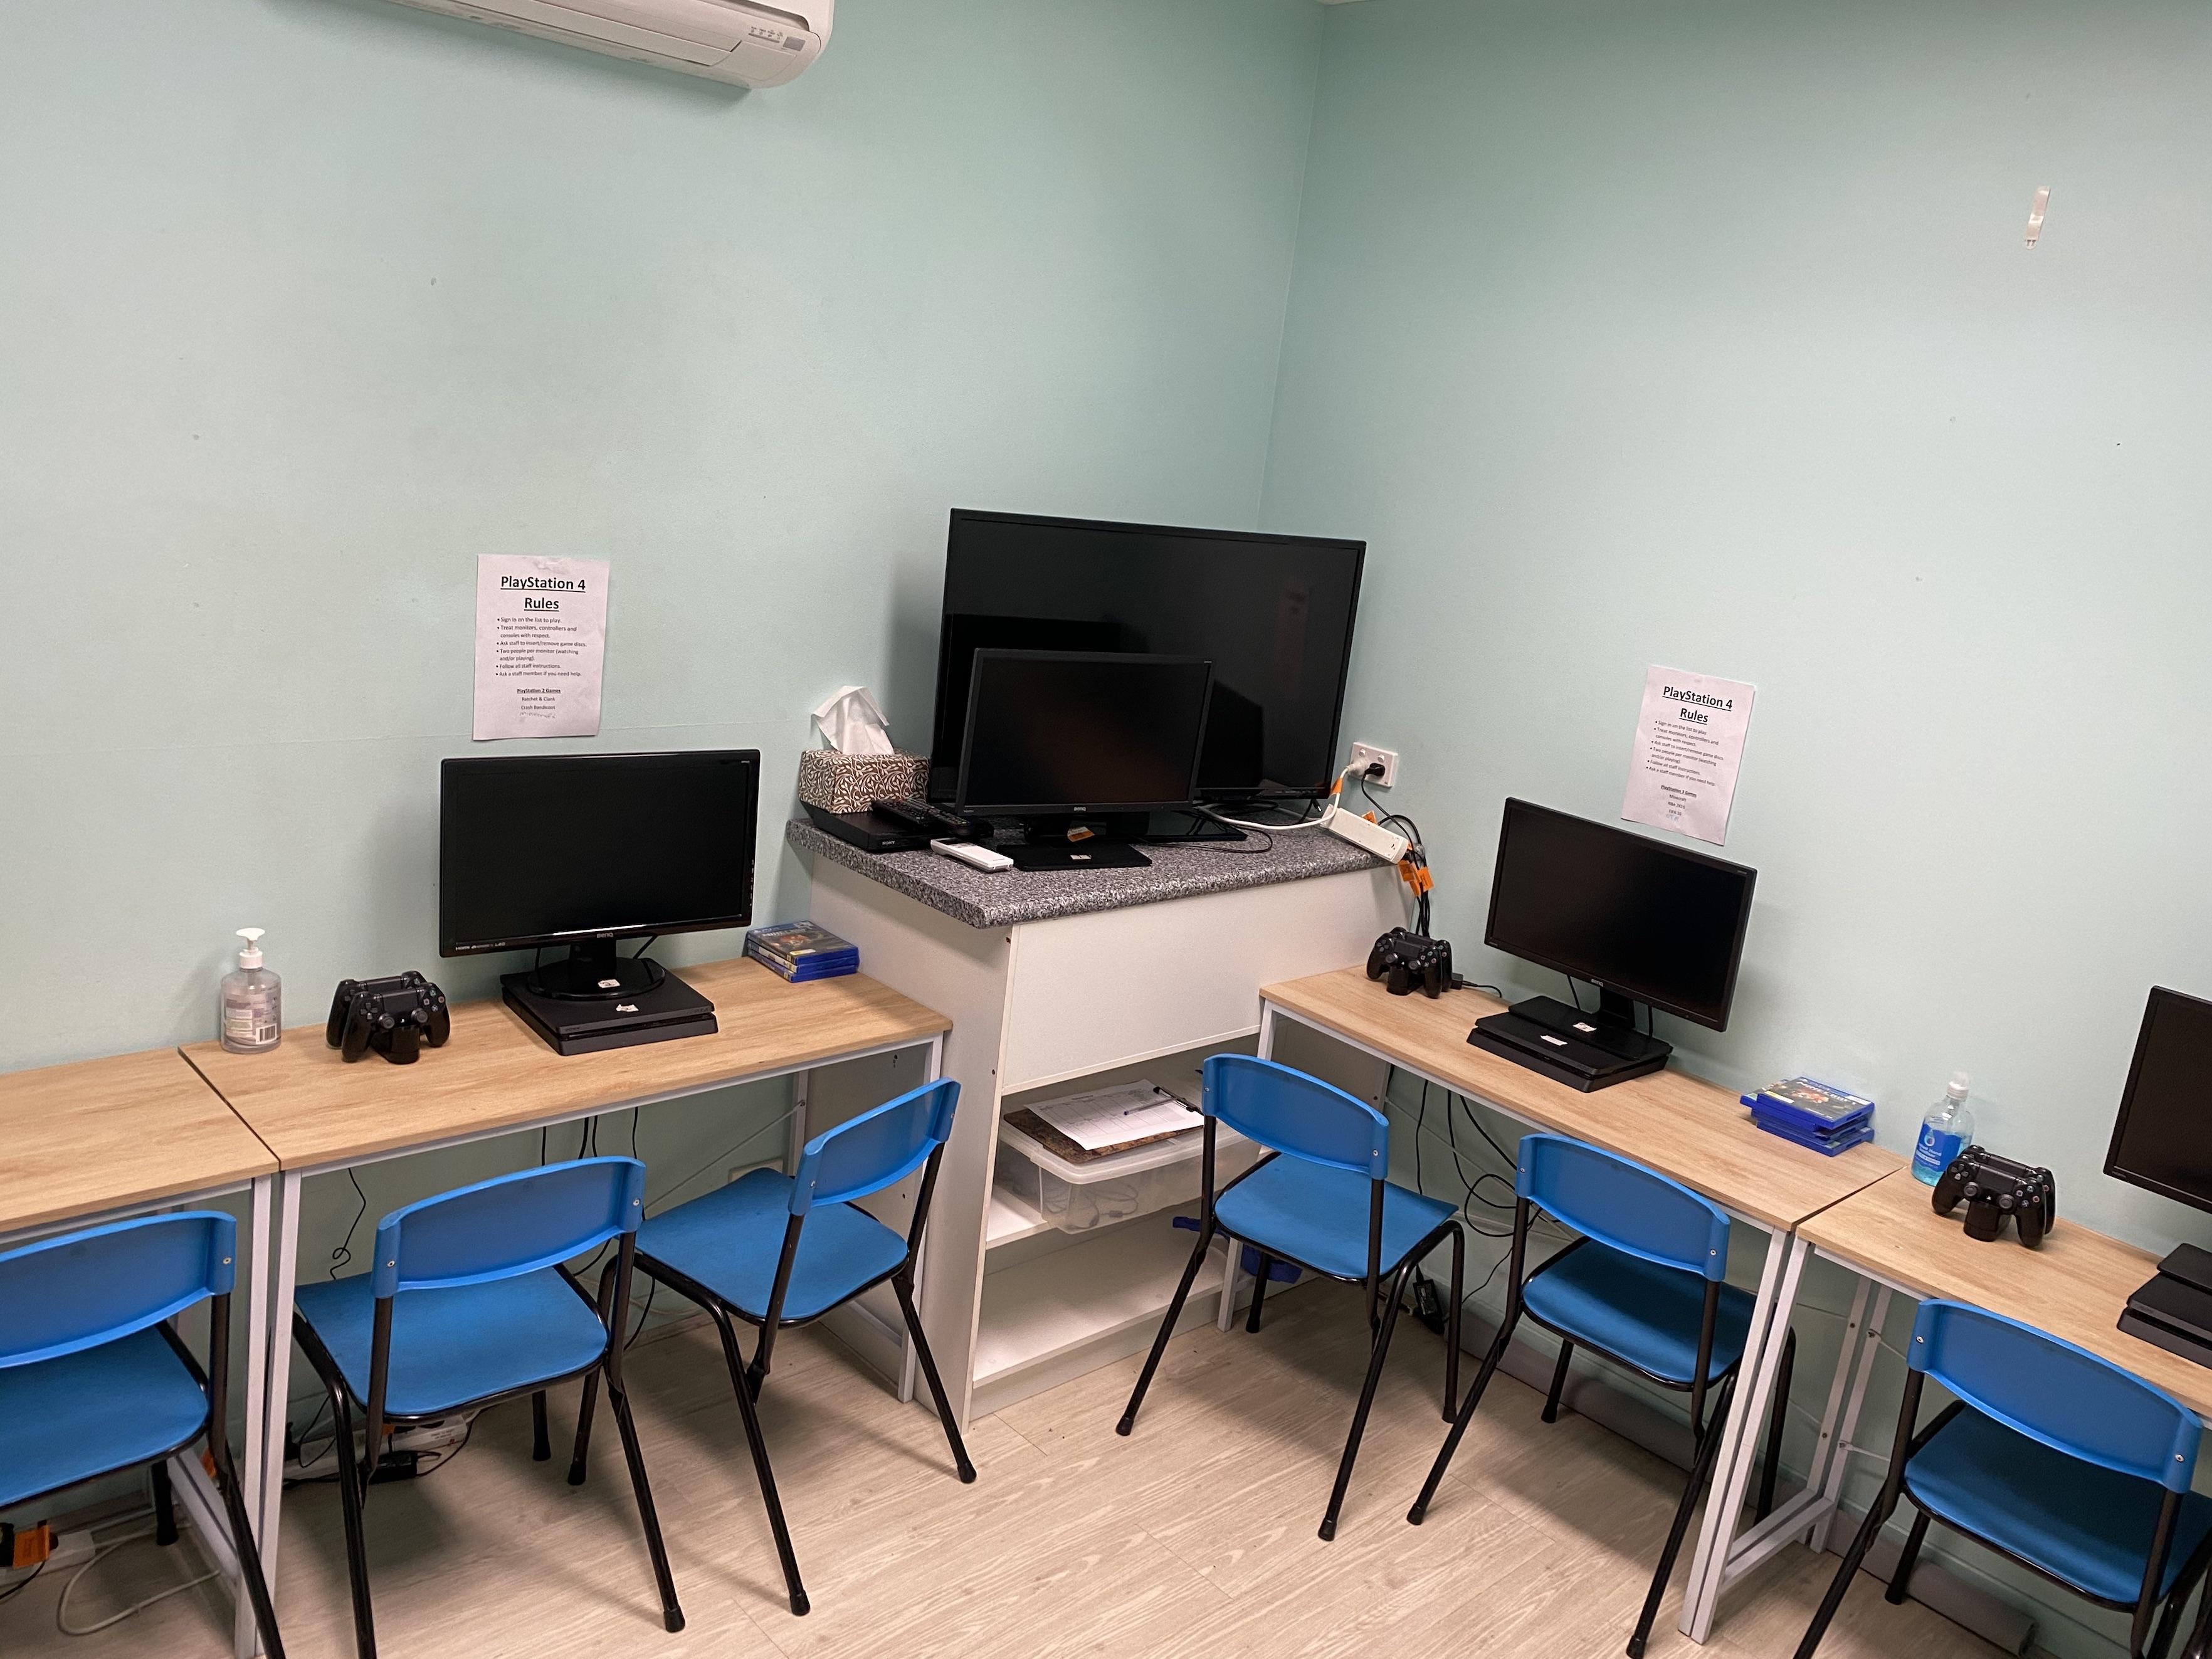 PS4 room